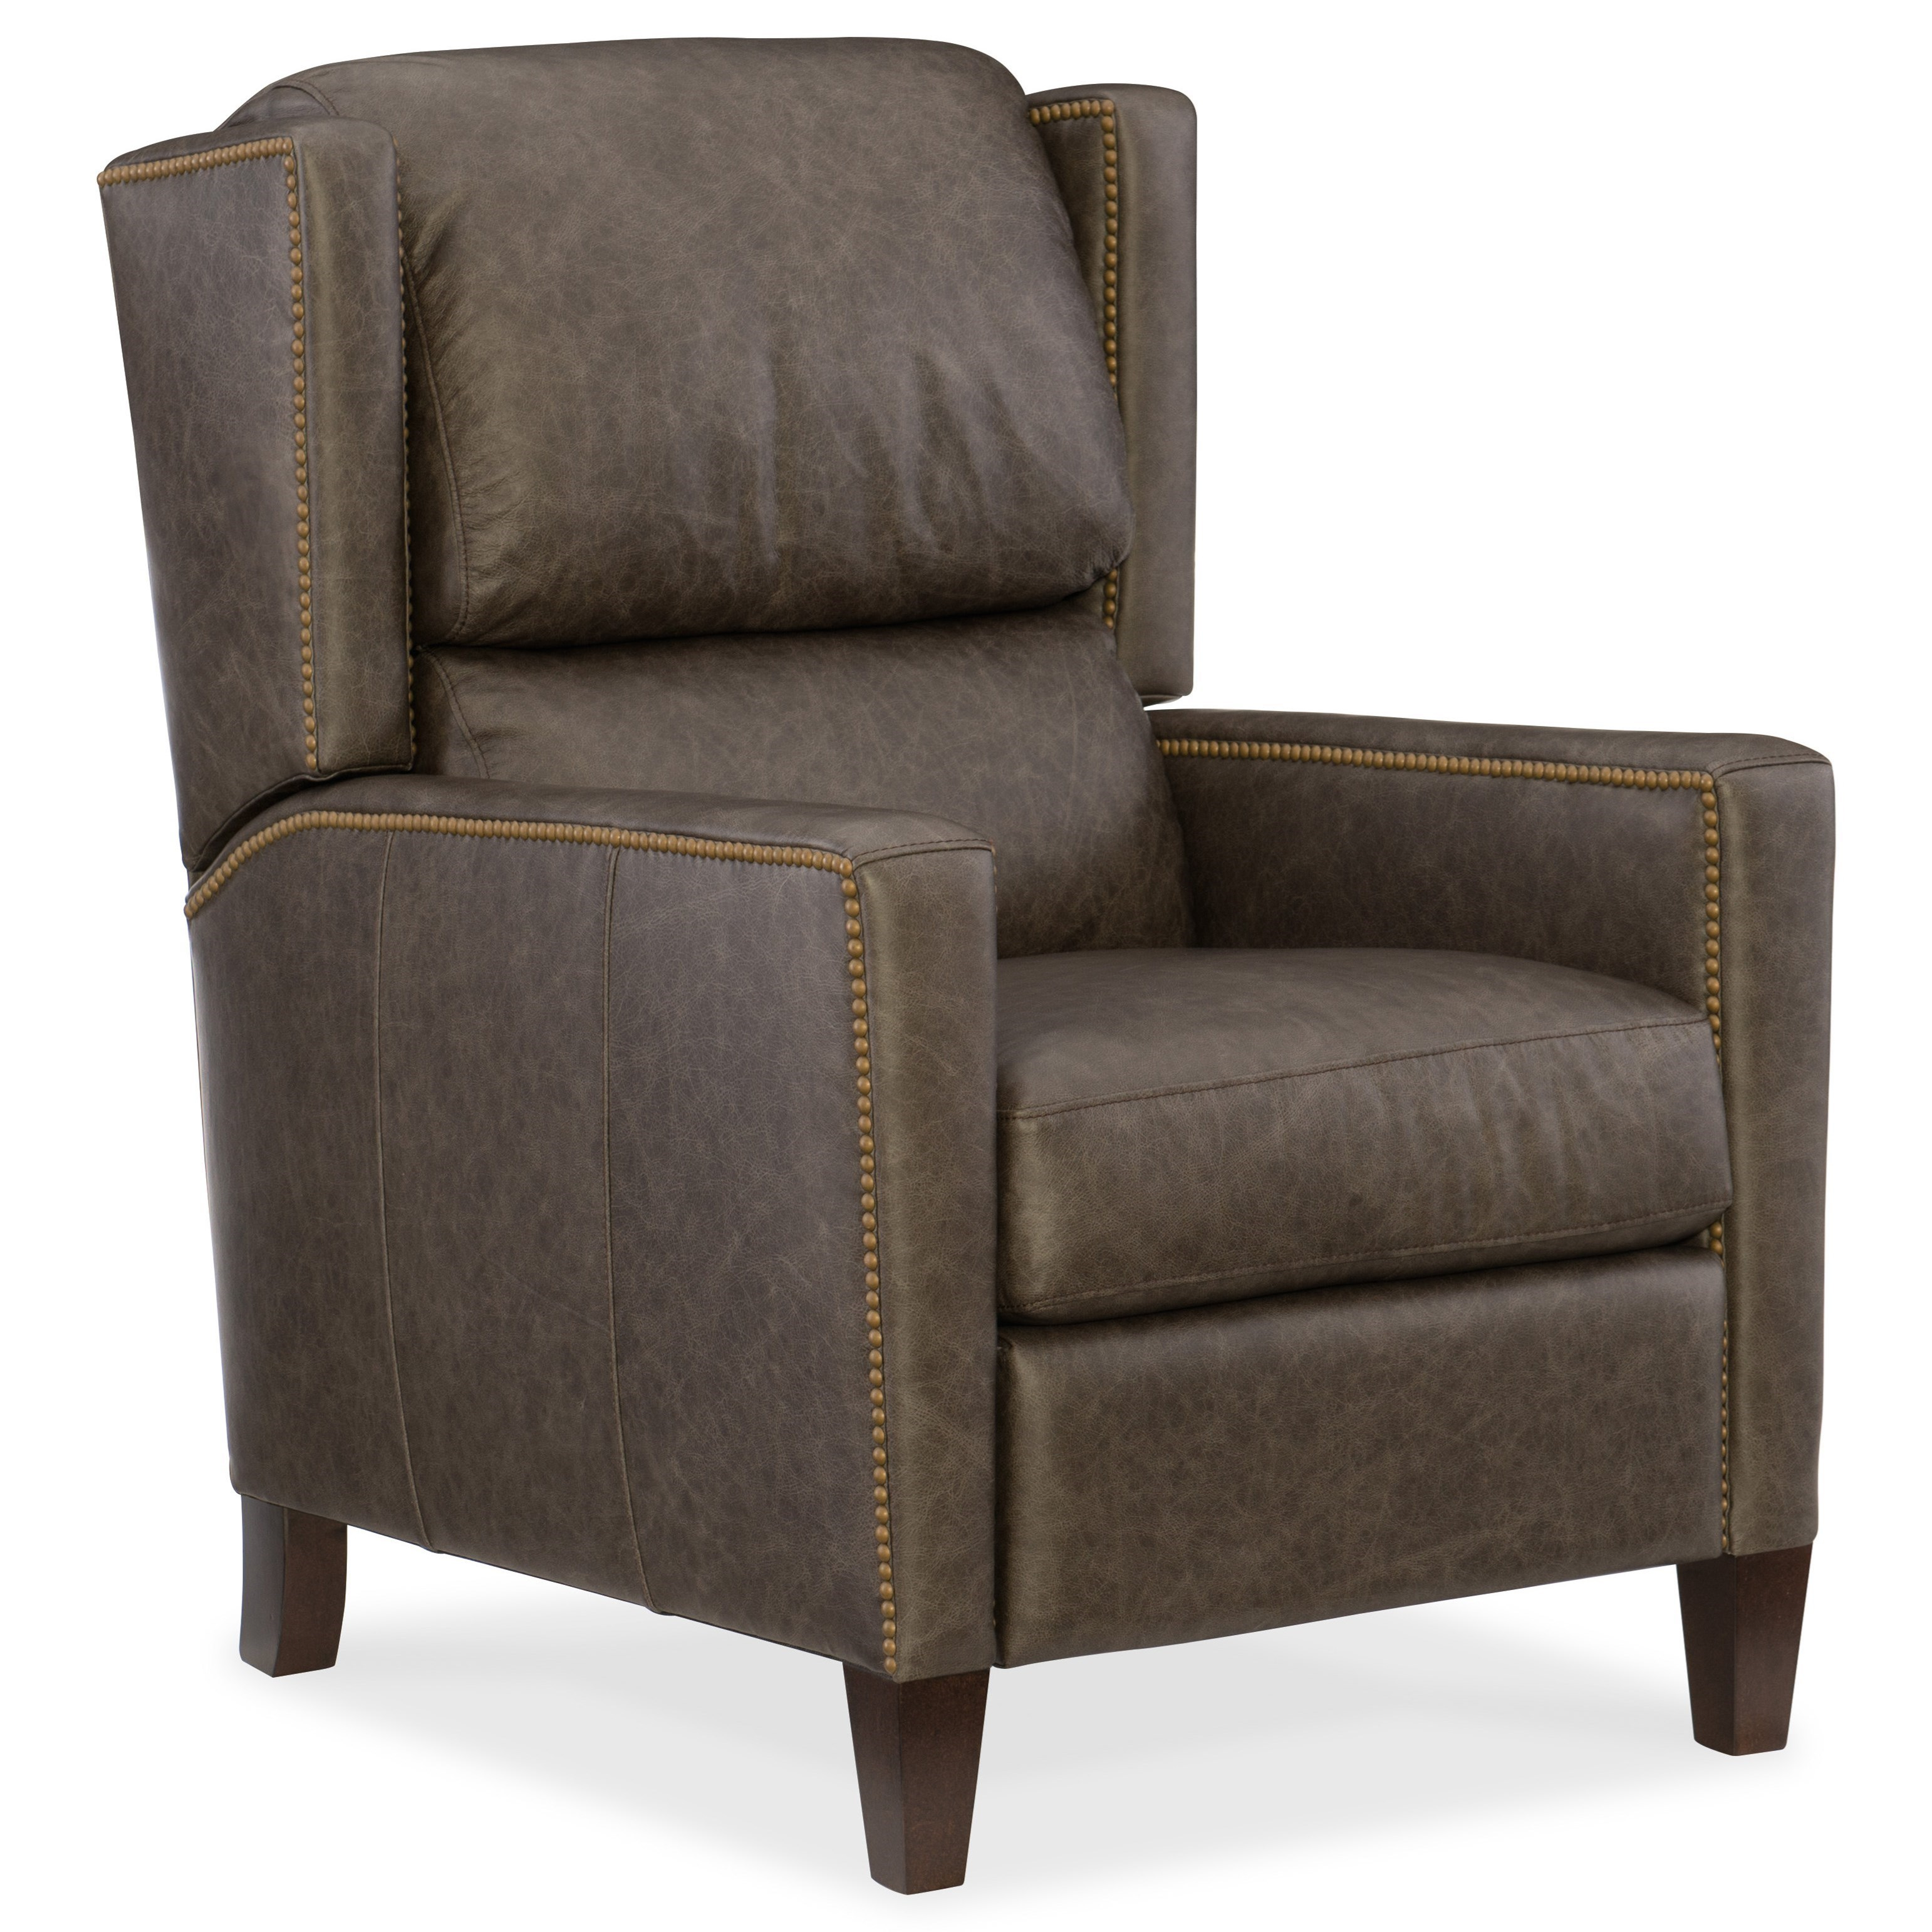 Hooker Furniture Reclining Chairs Paul Recliner With Nailhead Trim Fashion Furniture High